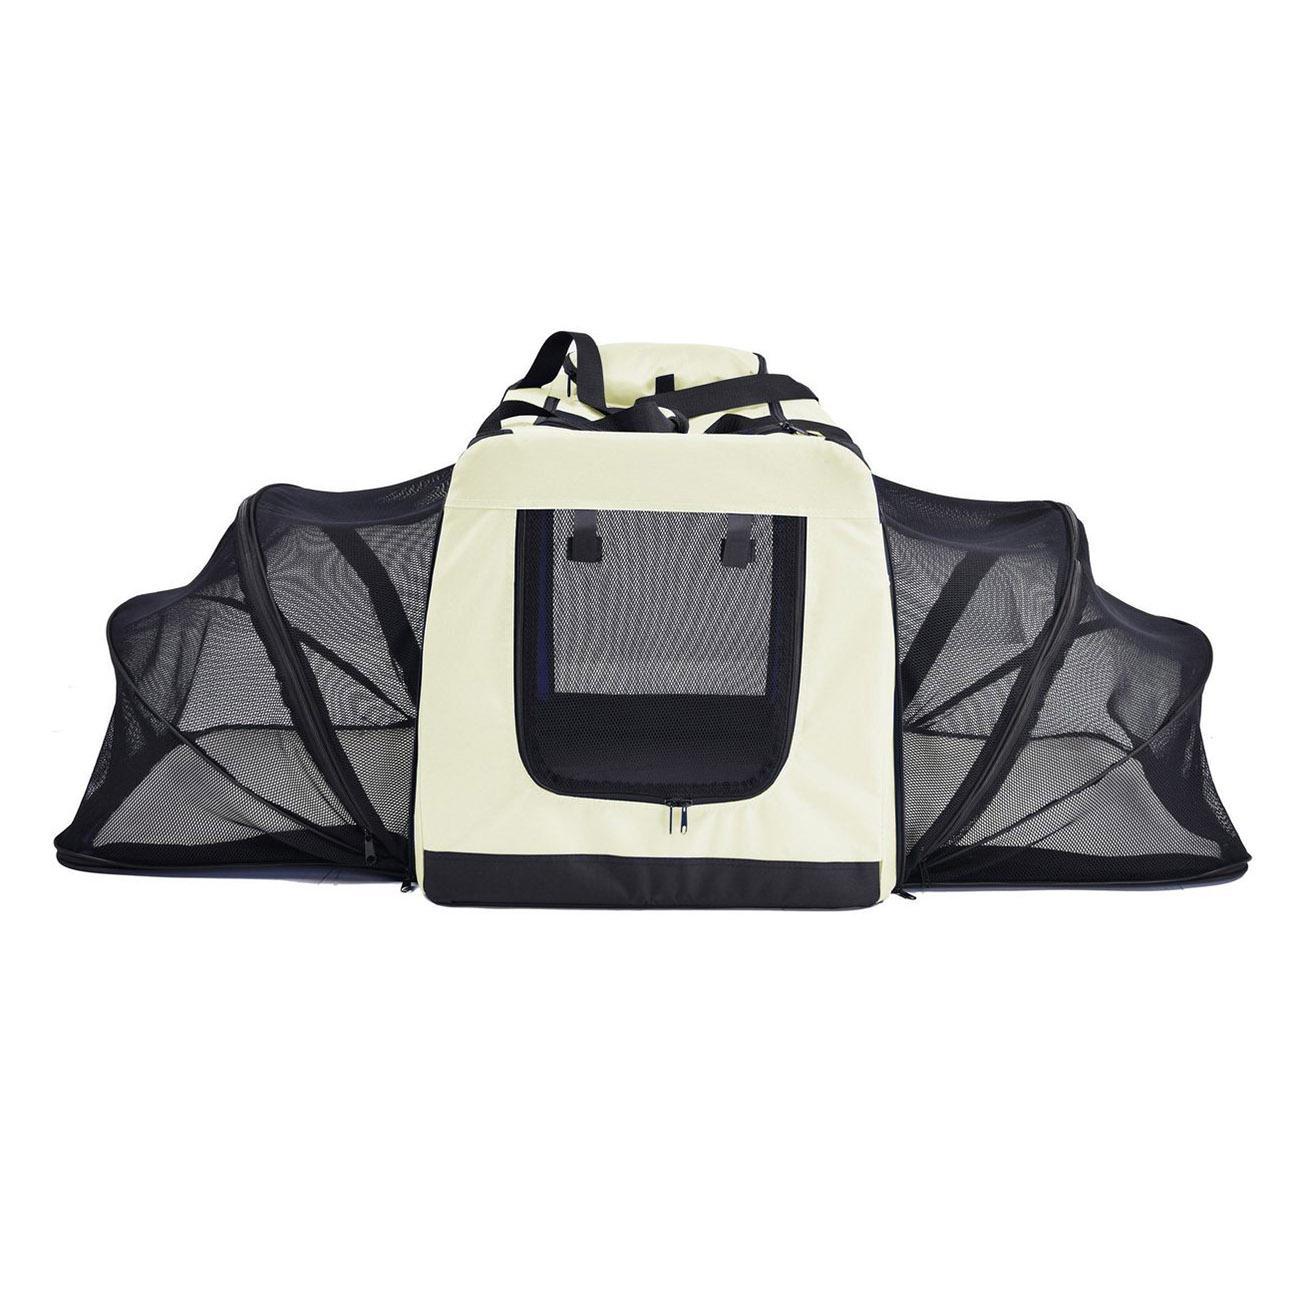 Pet Life 'Hounda Accordion' Metal Frame Soft Folding Expandable Dog Crate - Khaki